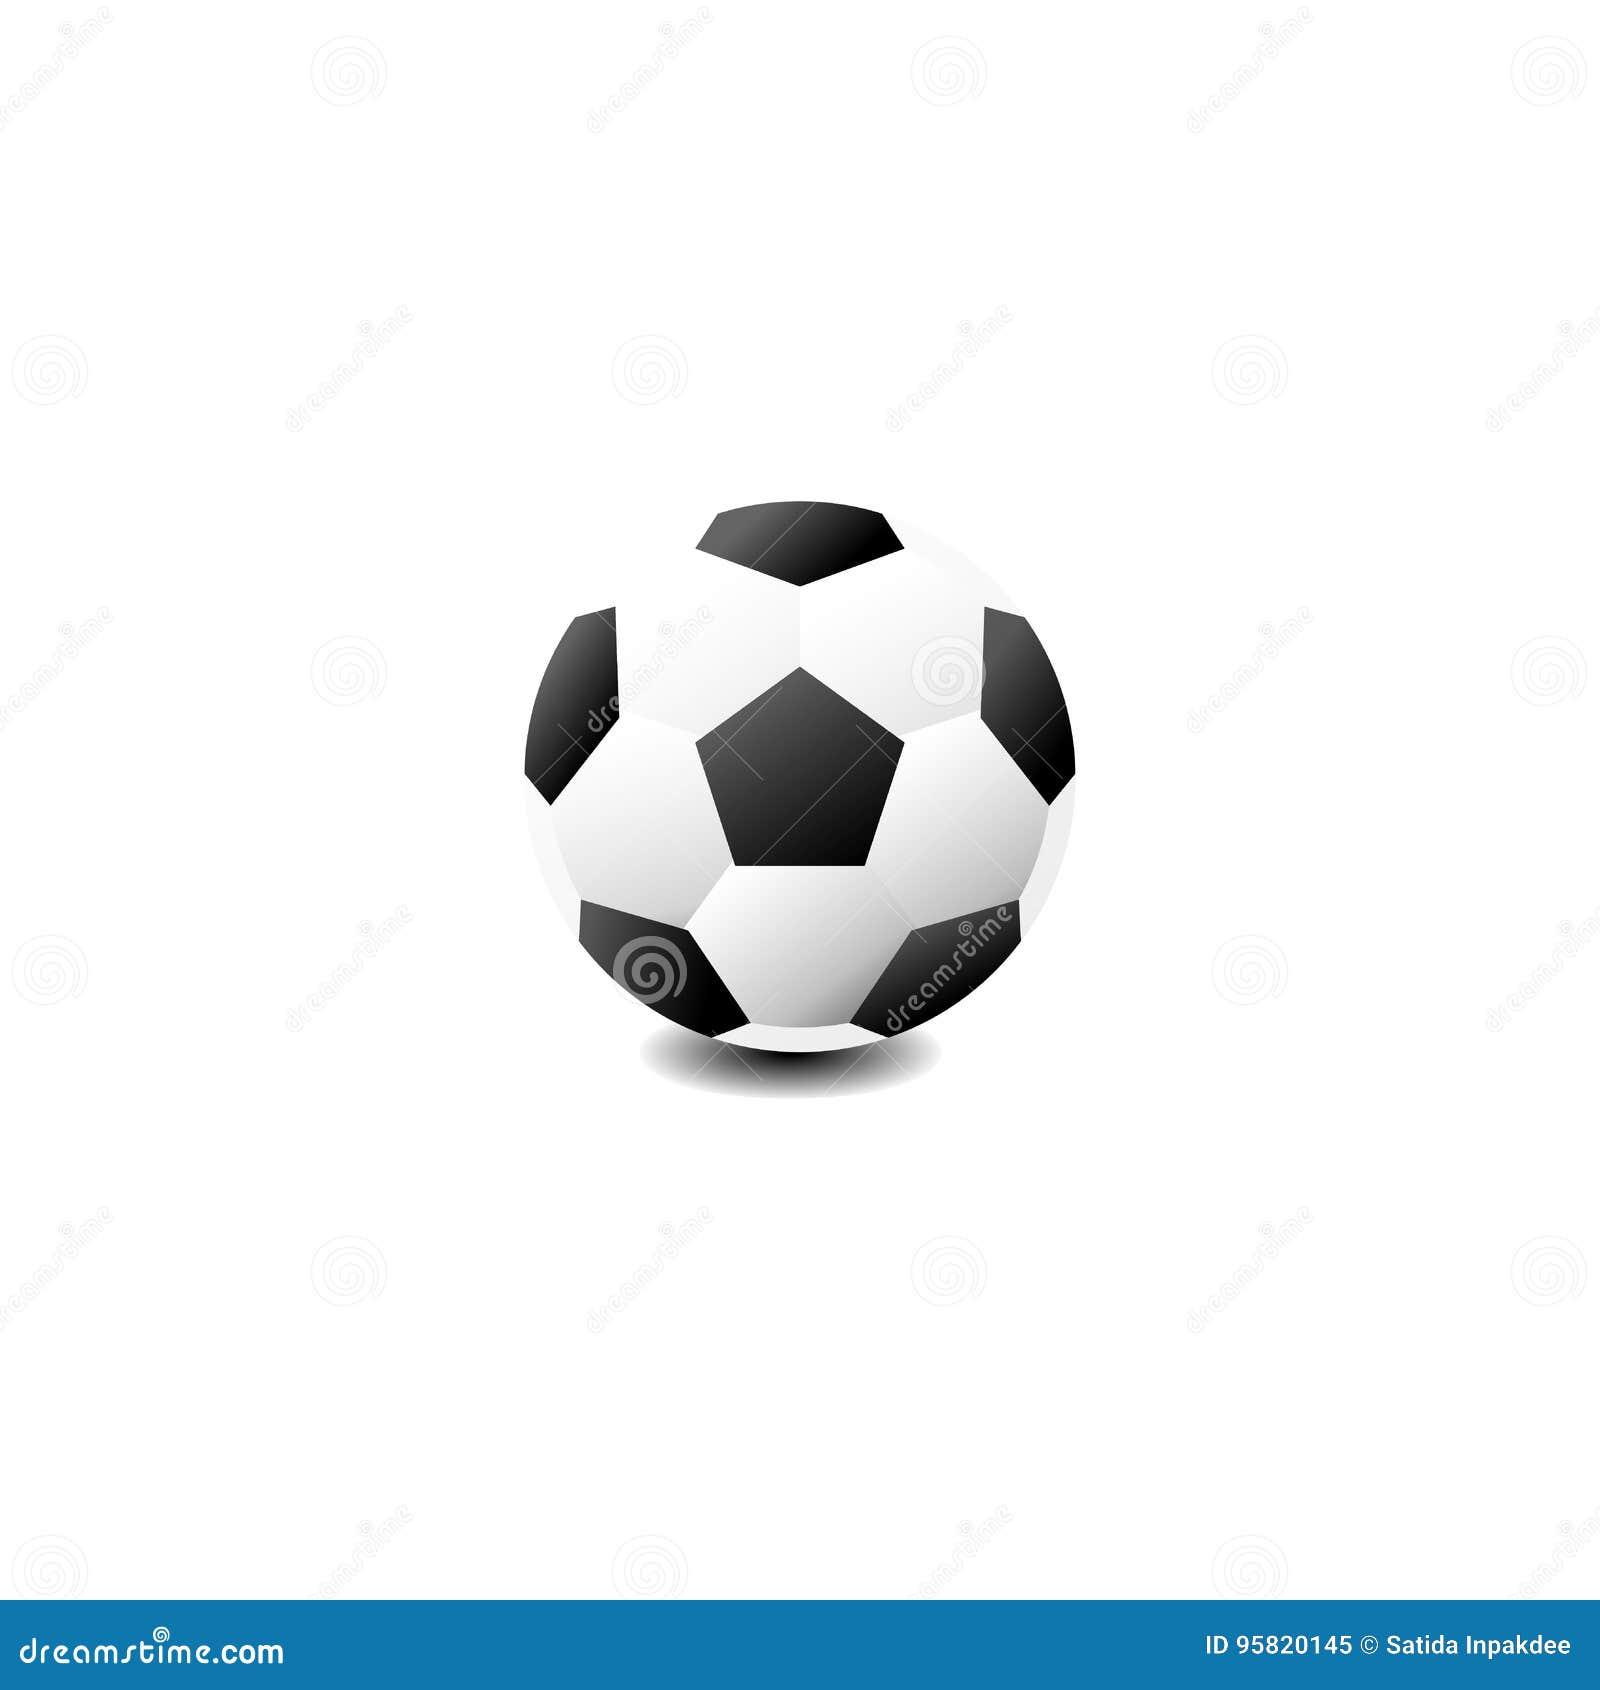 Fussball Symbol Stock Abbildung Illustration Von Nahaufnahme